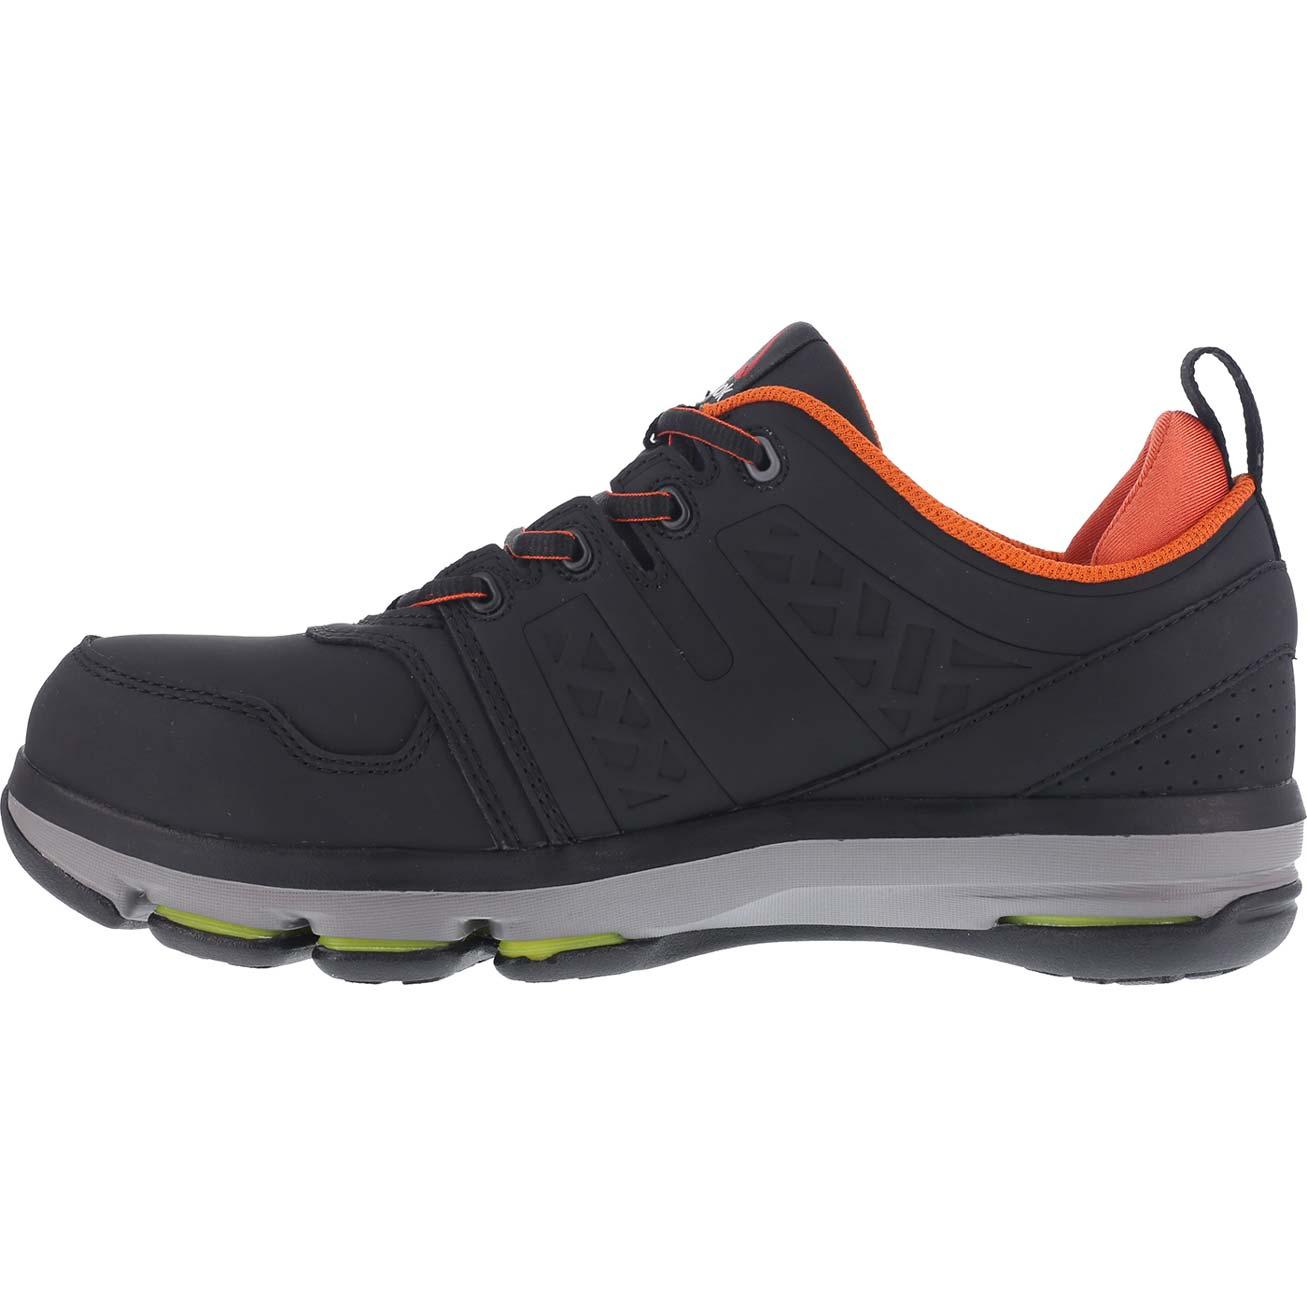 6531e64651eb2b Reebok DMX Flex Work Alloy Toe Work Athletic Shoe